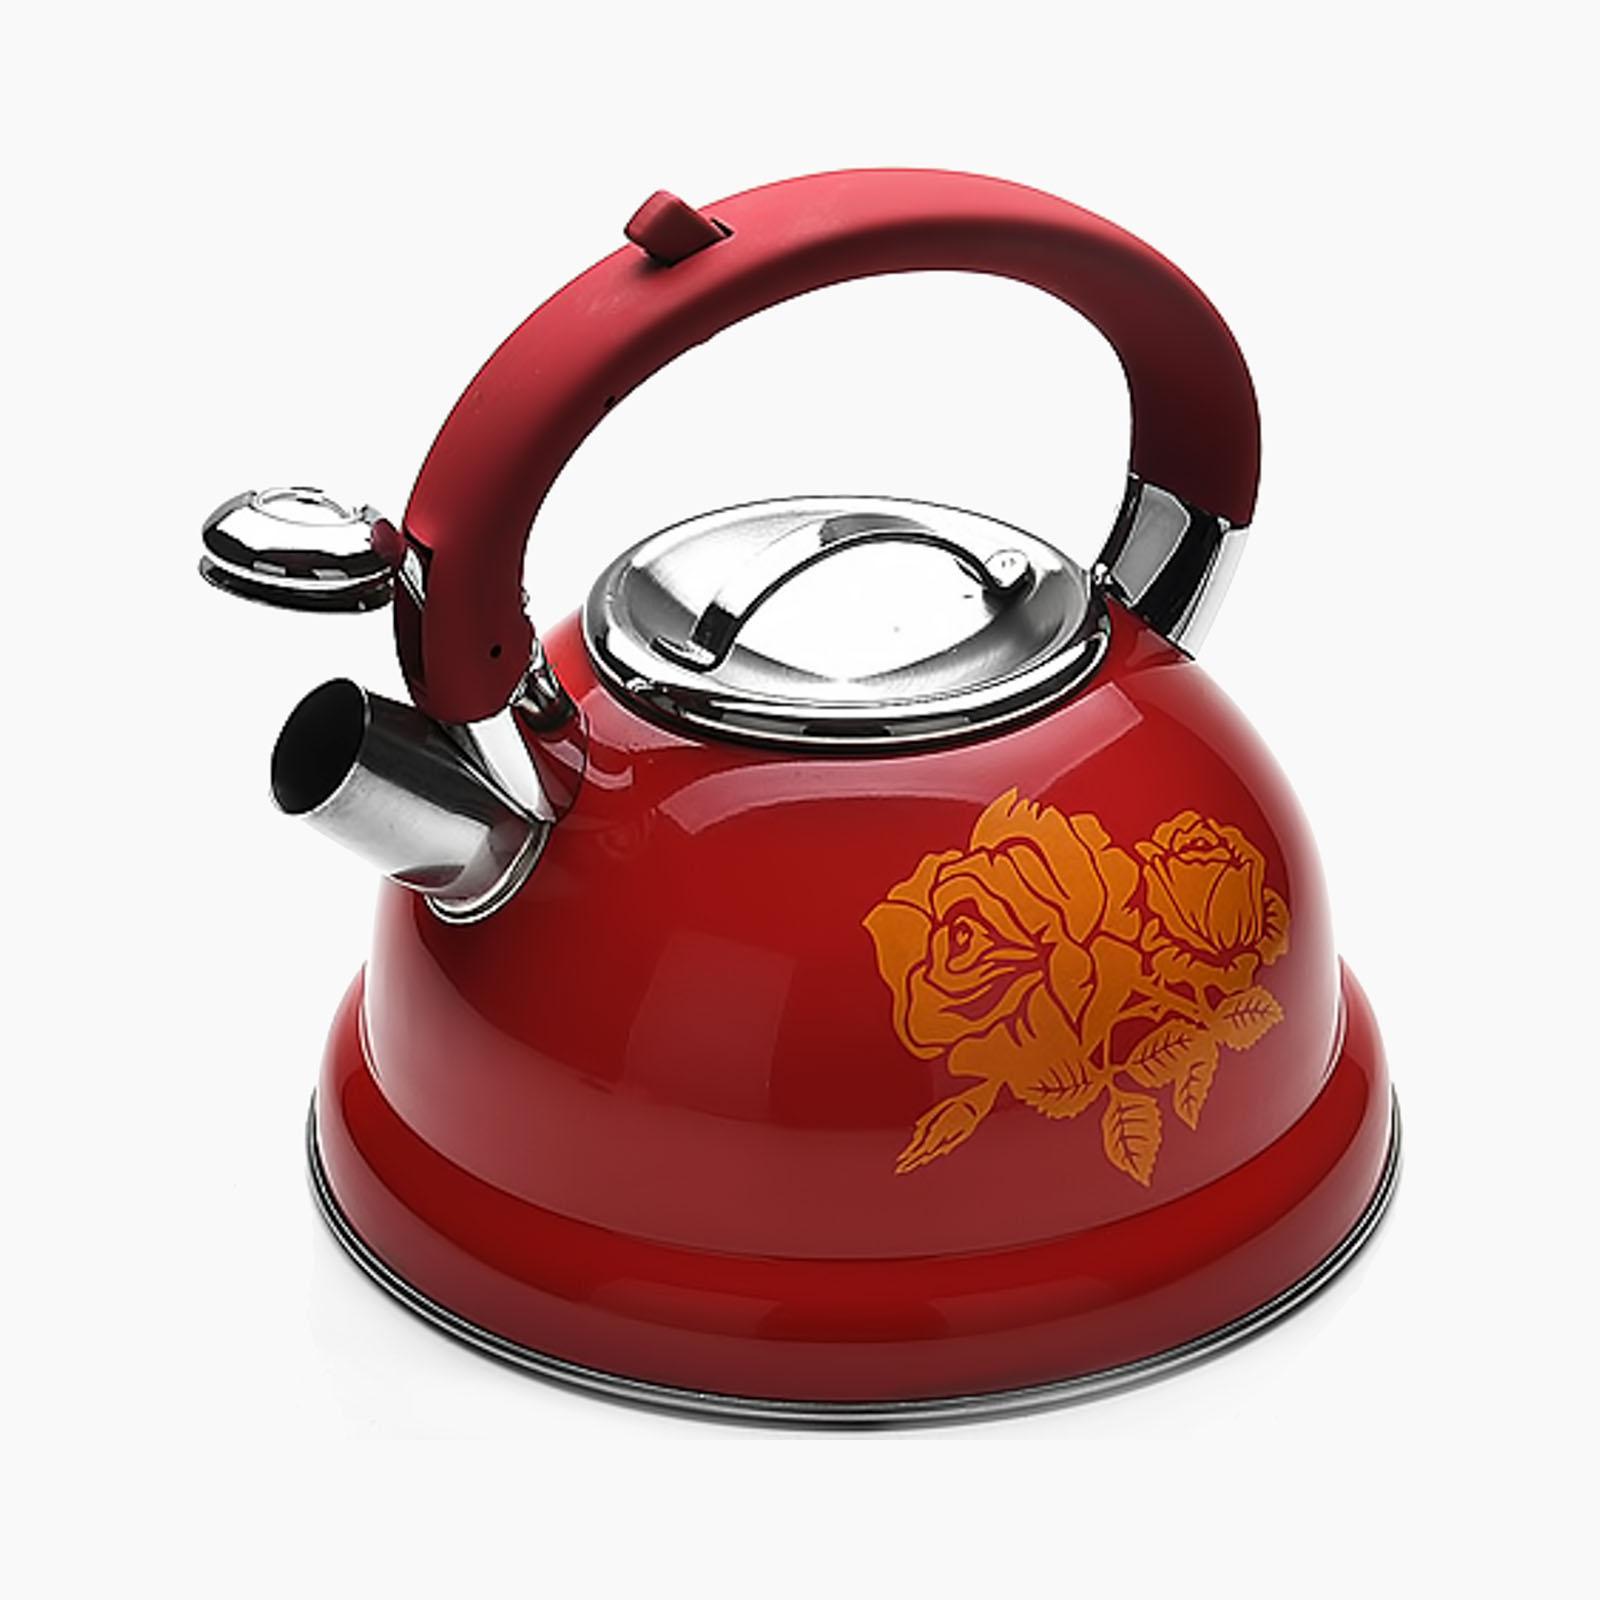 "Чайник со свистком ""Роза страсти"", 2,6 литра"